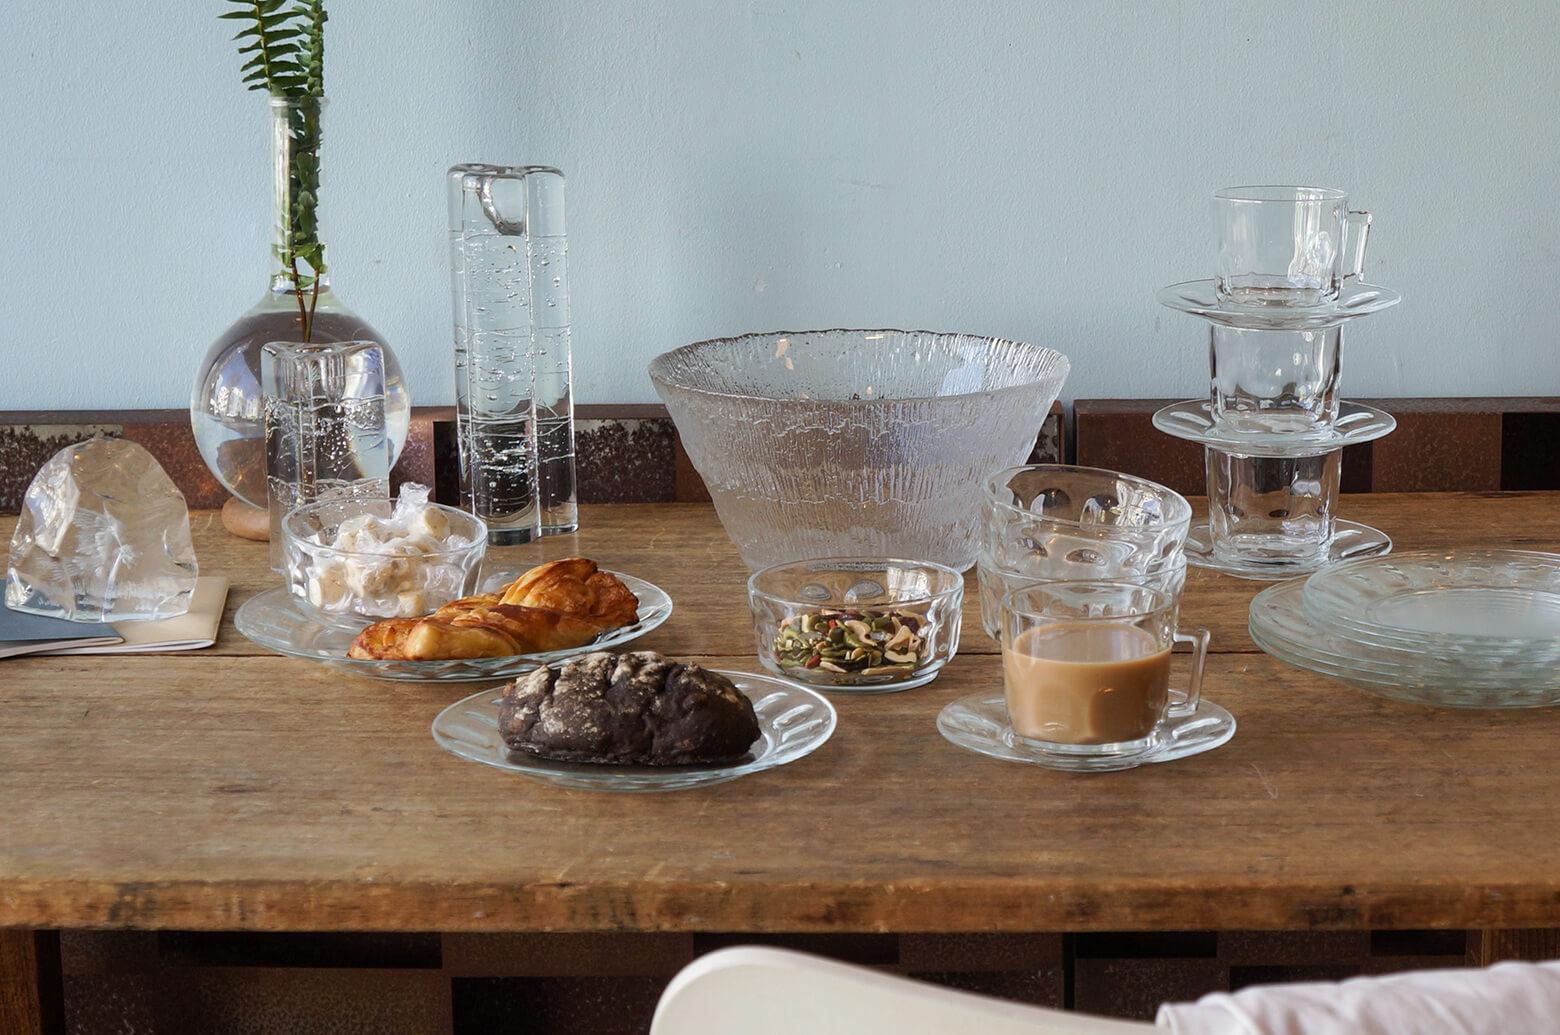 arcoroc Glass Ware Made In France/アルコロック ガラスウェア フランス製 食器 レトロ